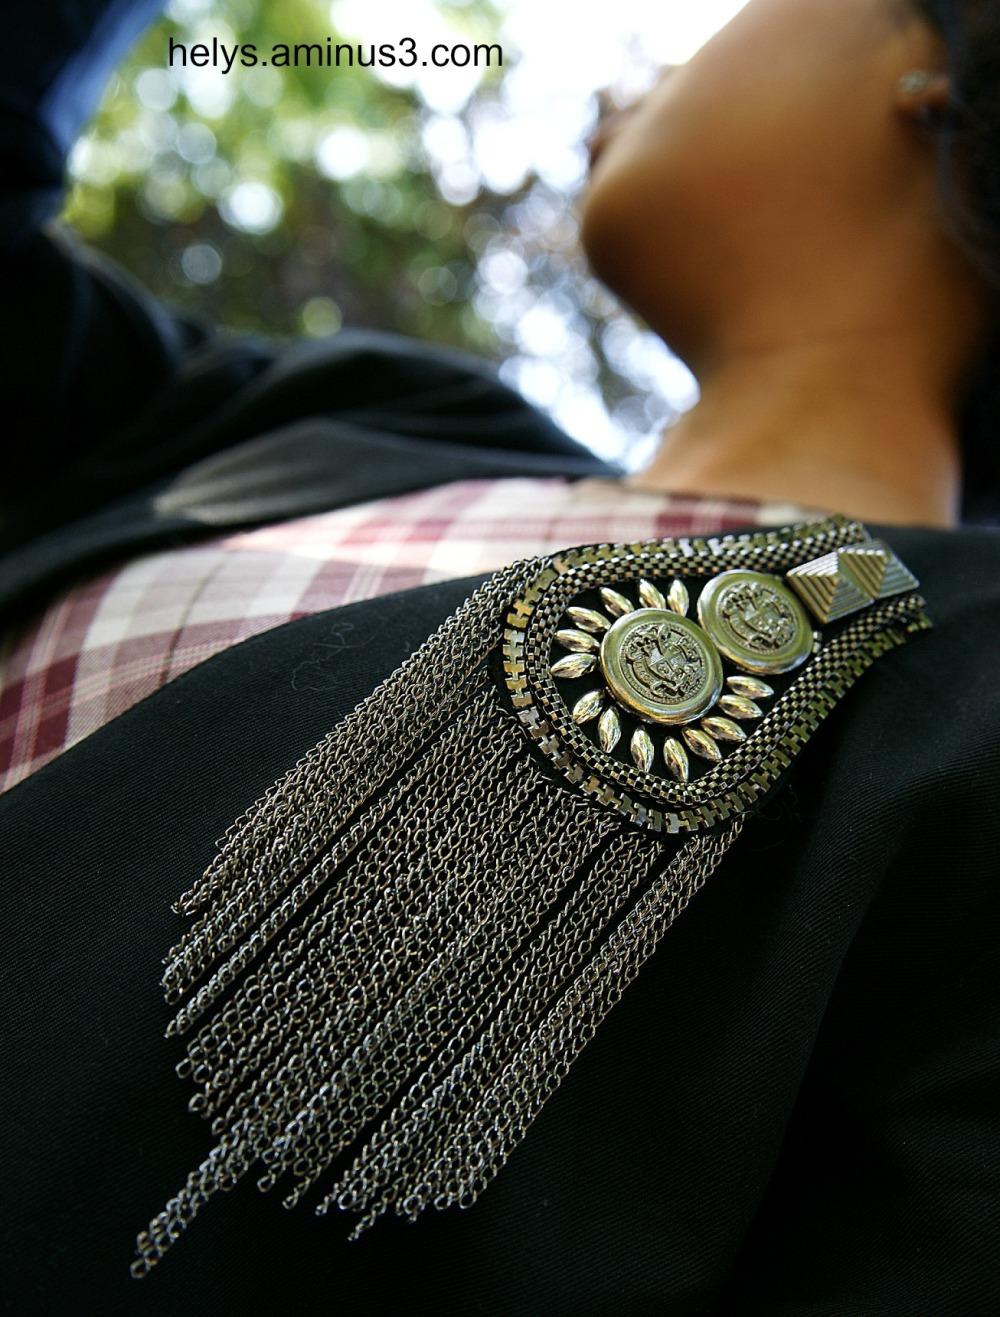 The brooch